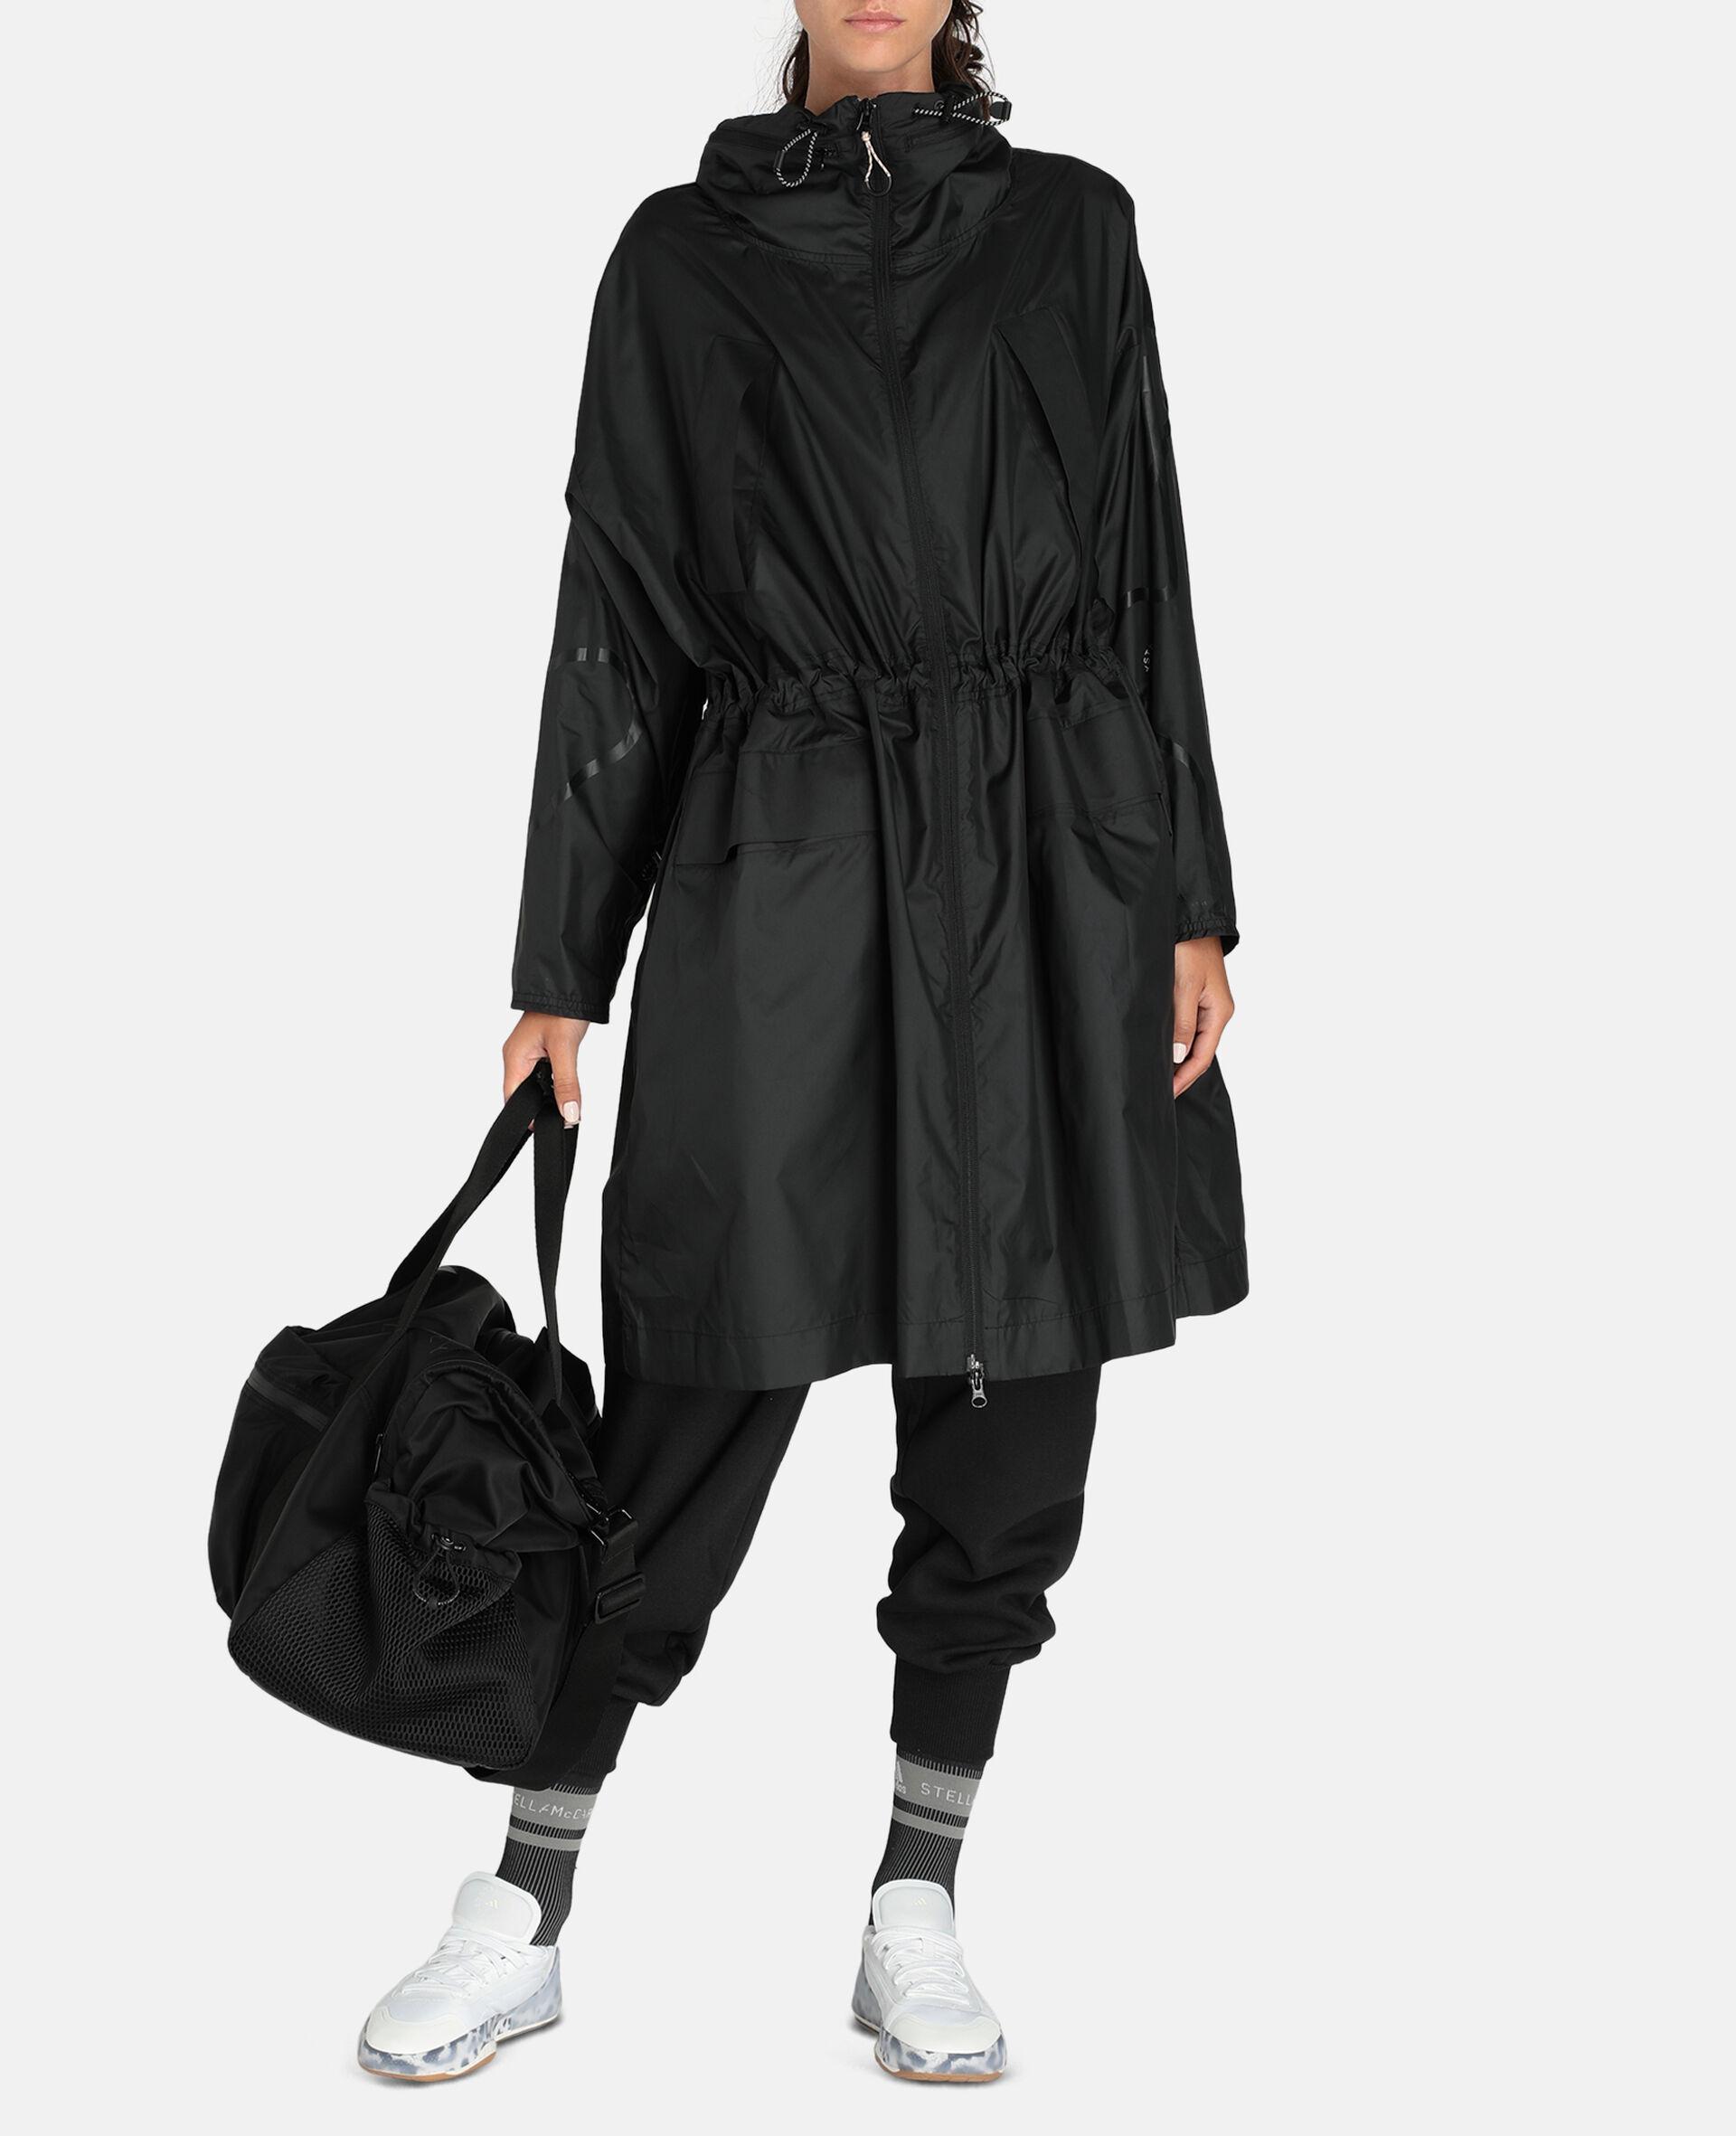 Gray Training Sweatpants-Black-large image number 1